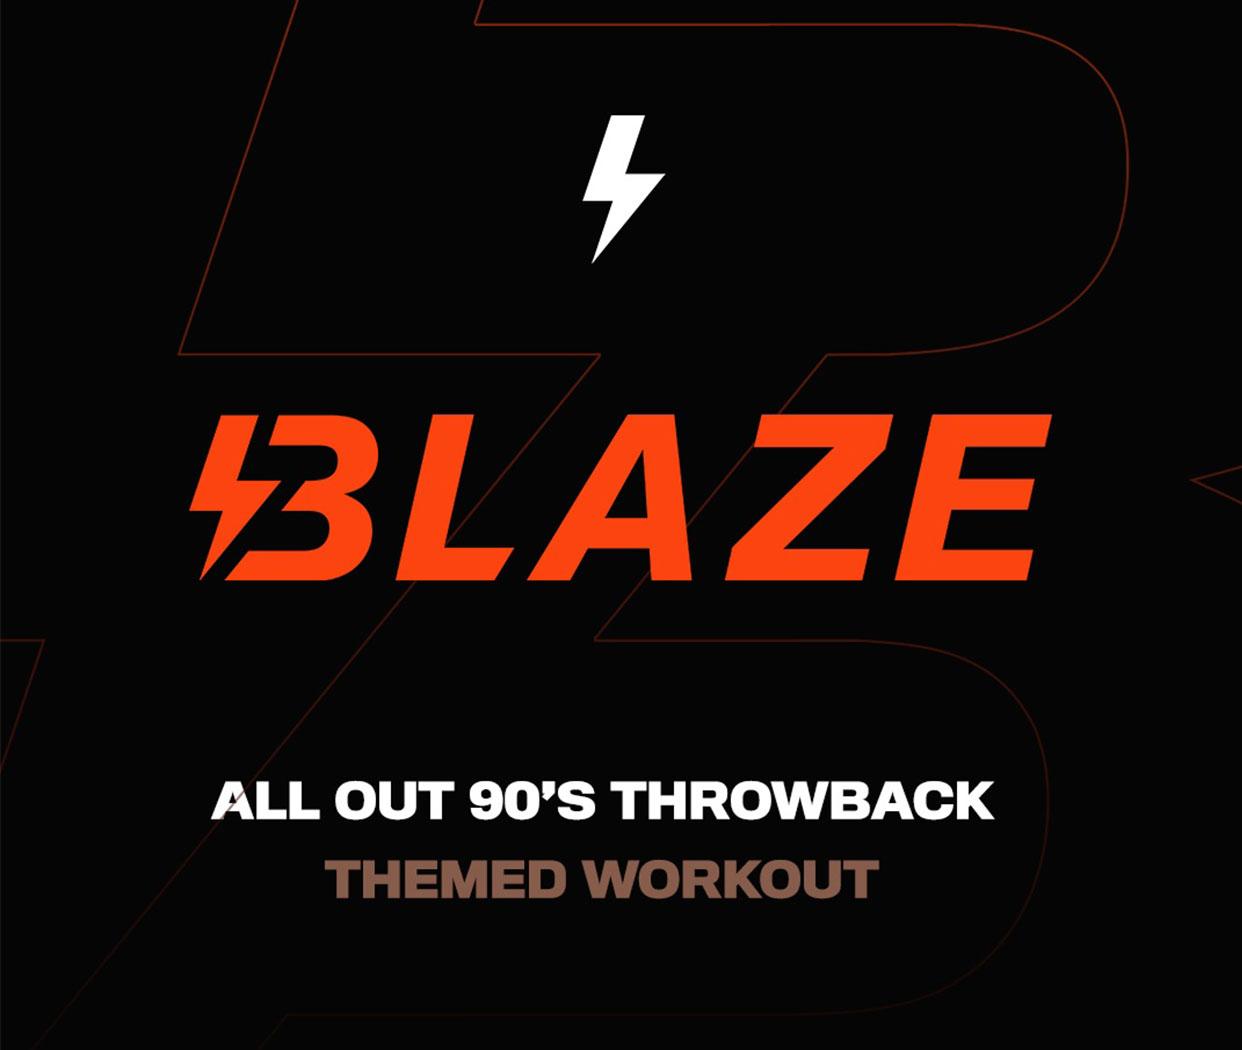 Blaze - 90's Throwback!